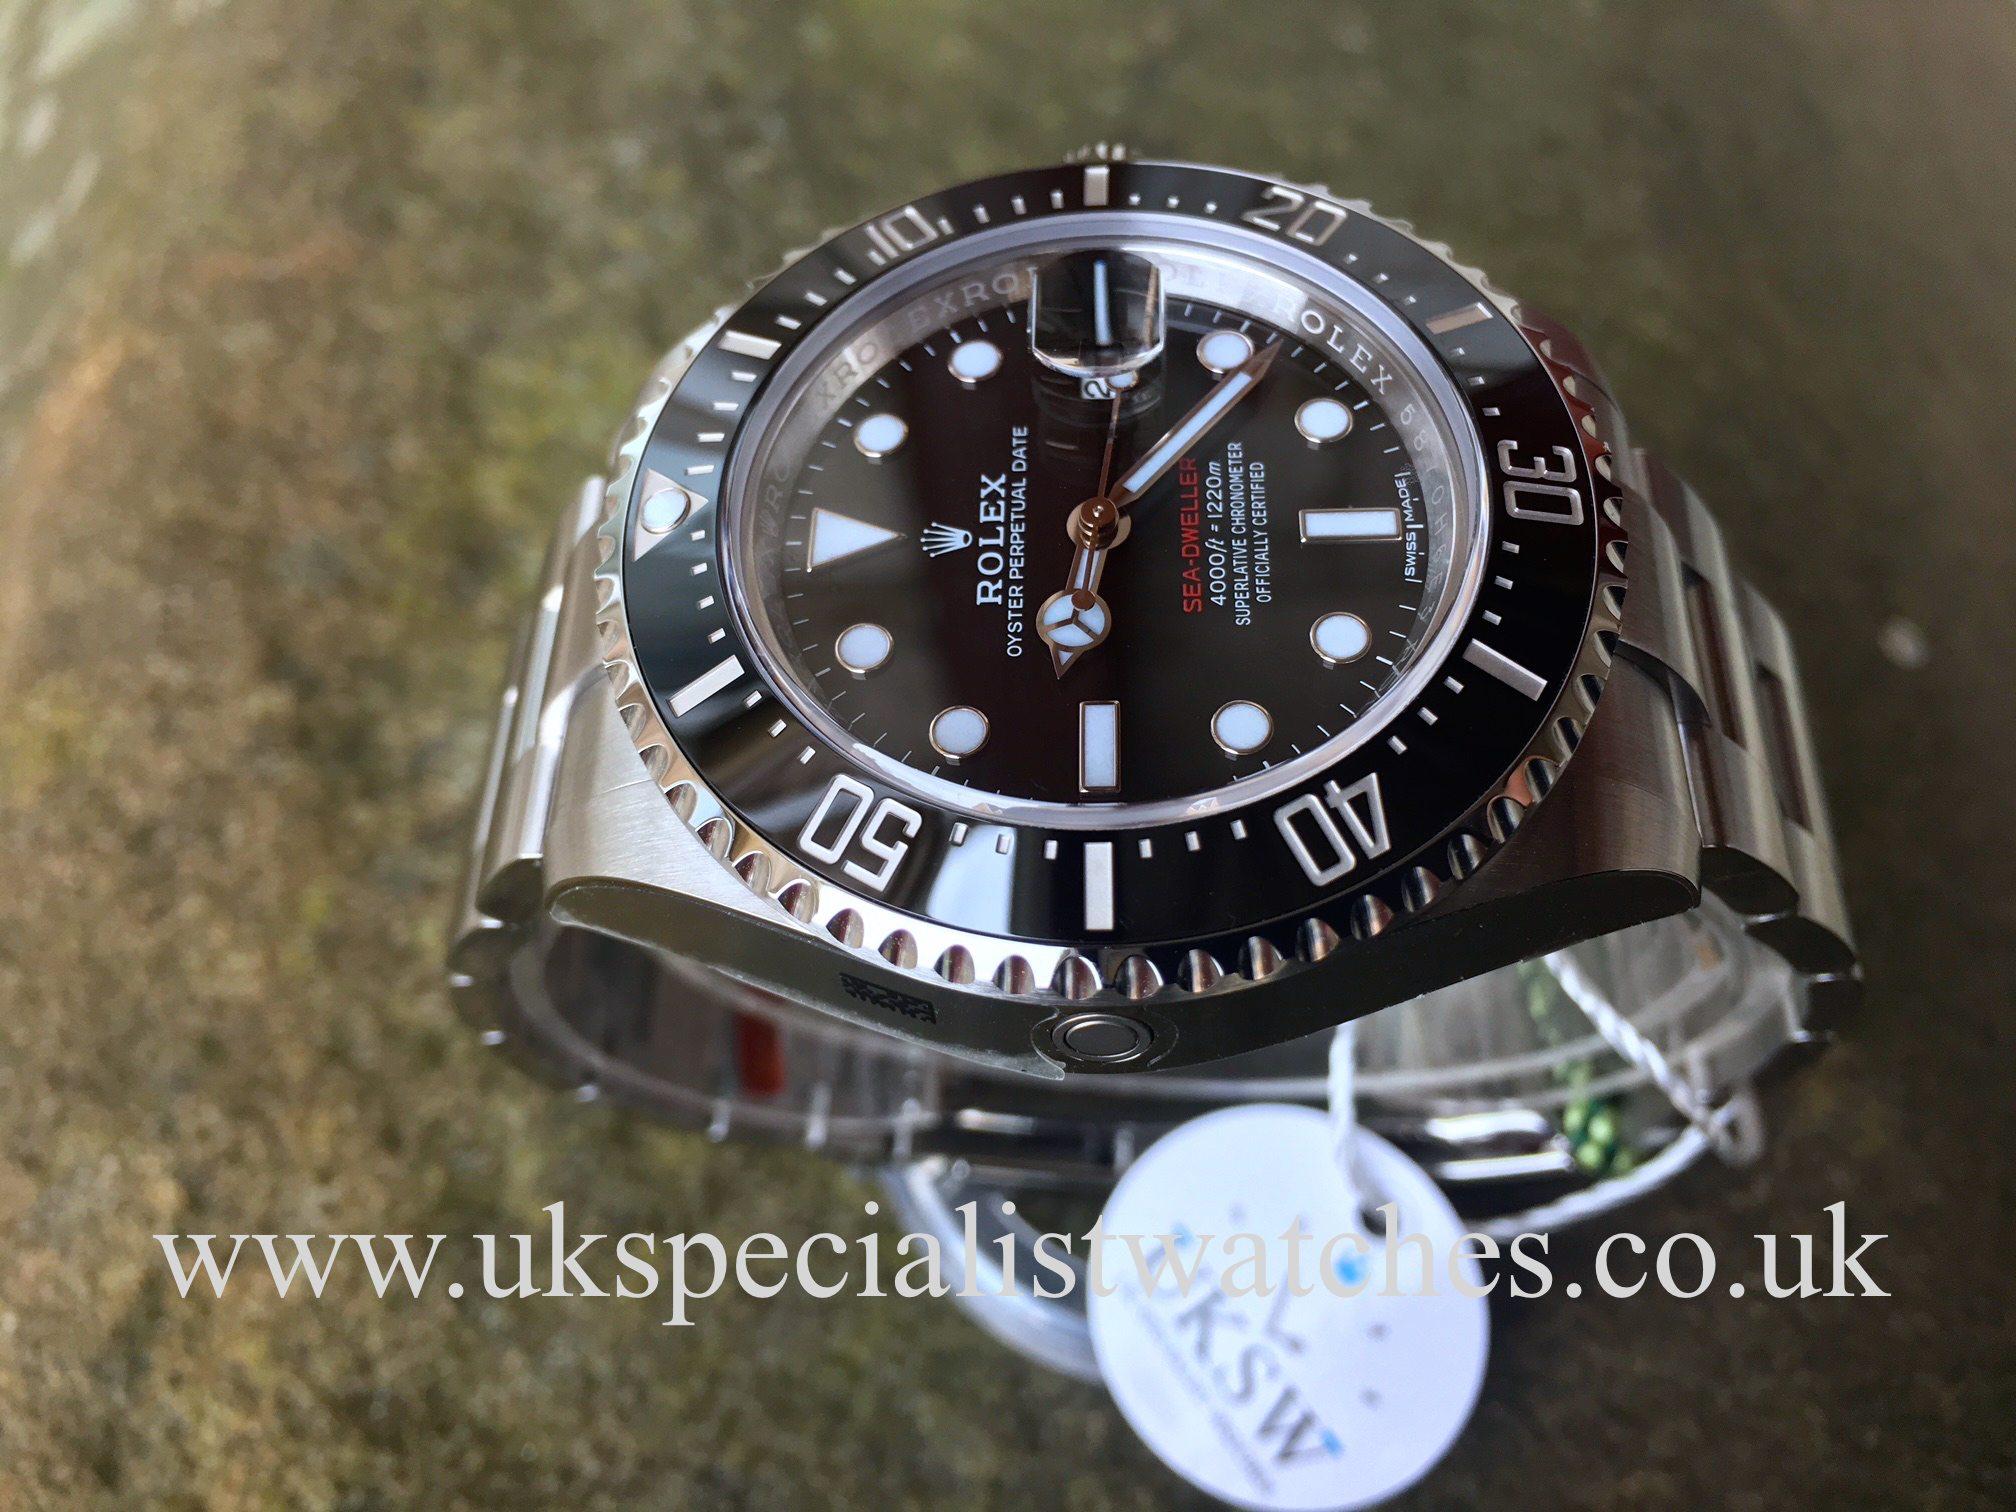 Rolex Sea Dweller 126600 Red Writing 50th Anniversary